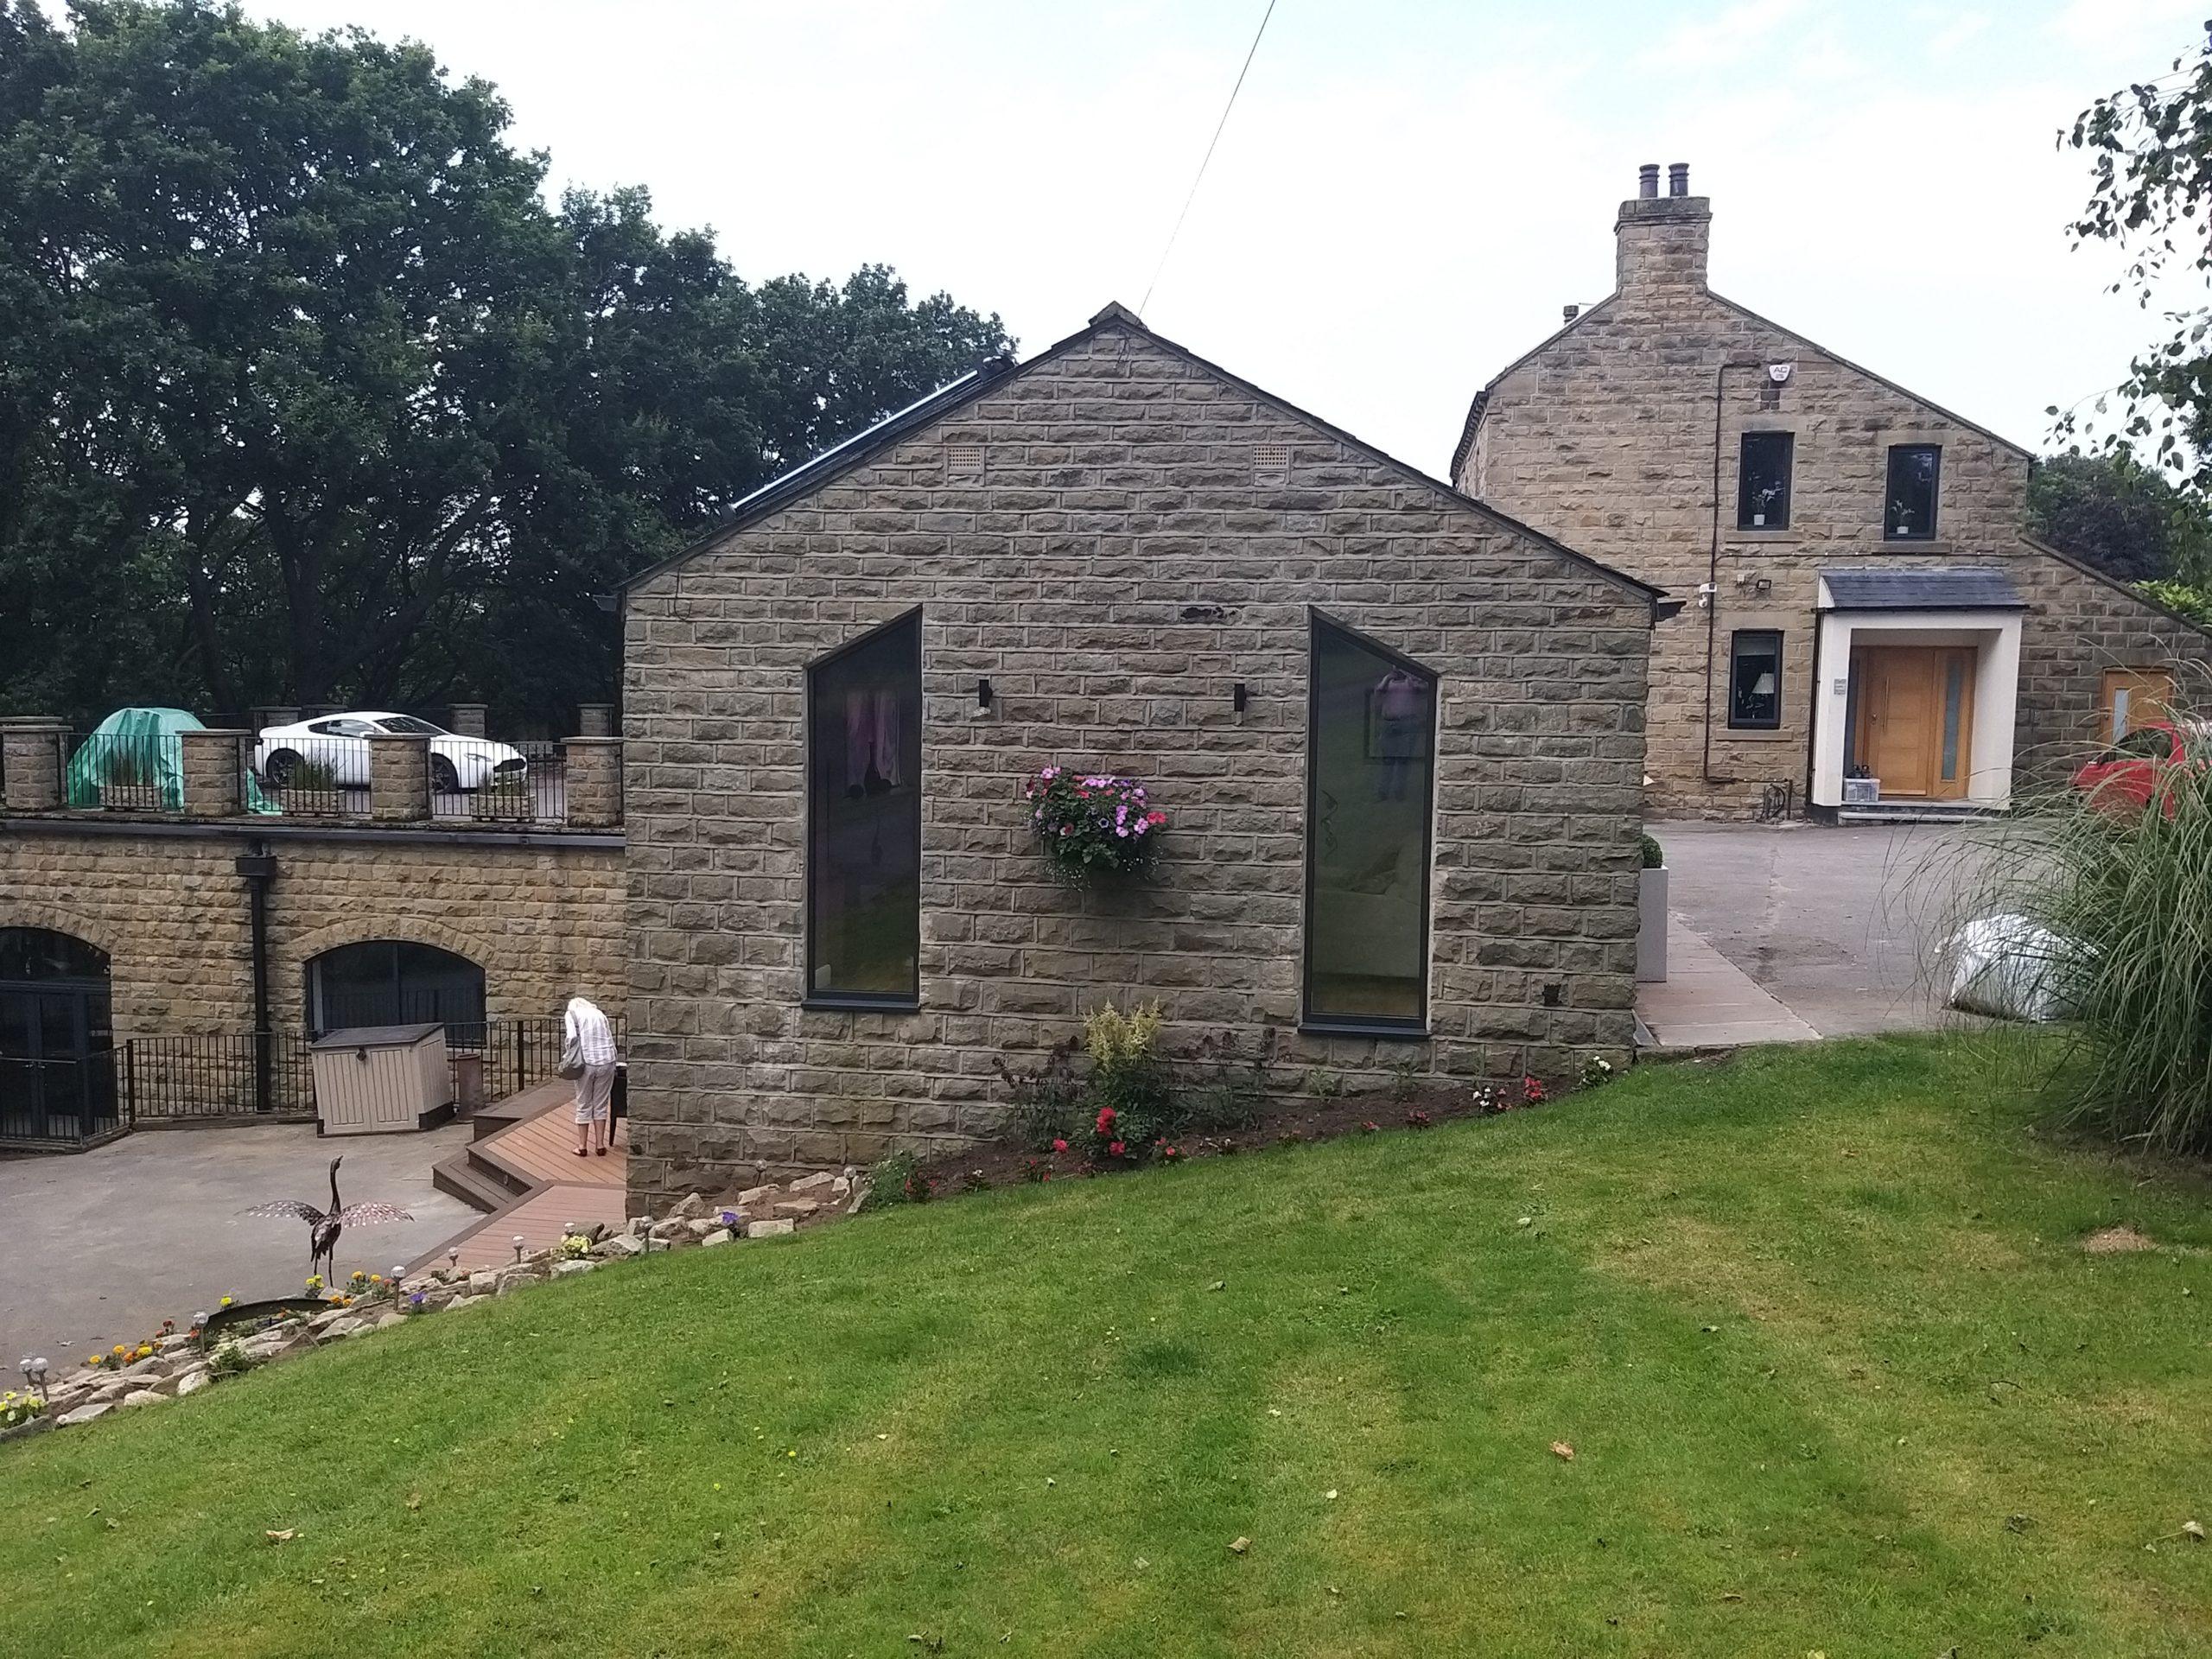 Garage conversion windows and outside arrangement